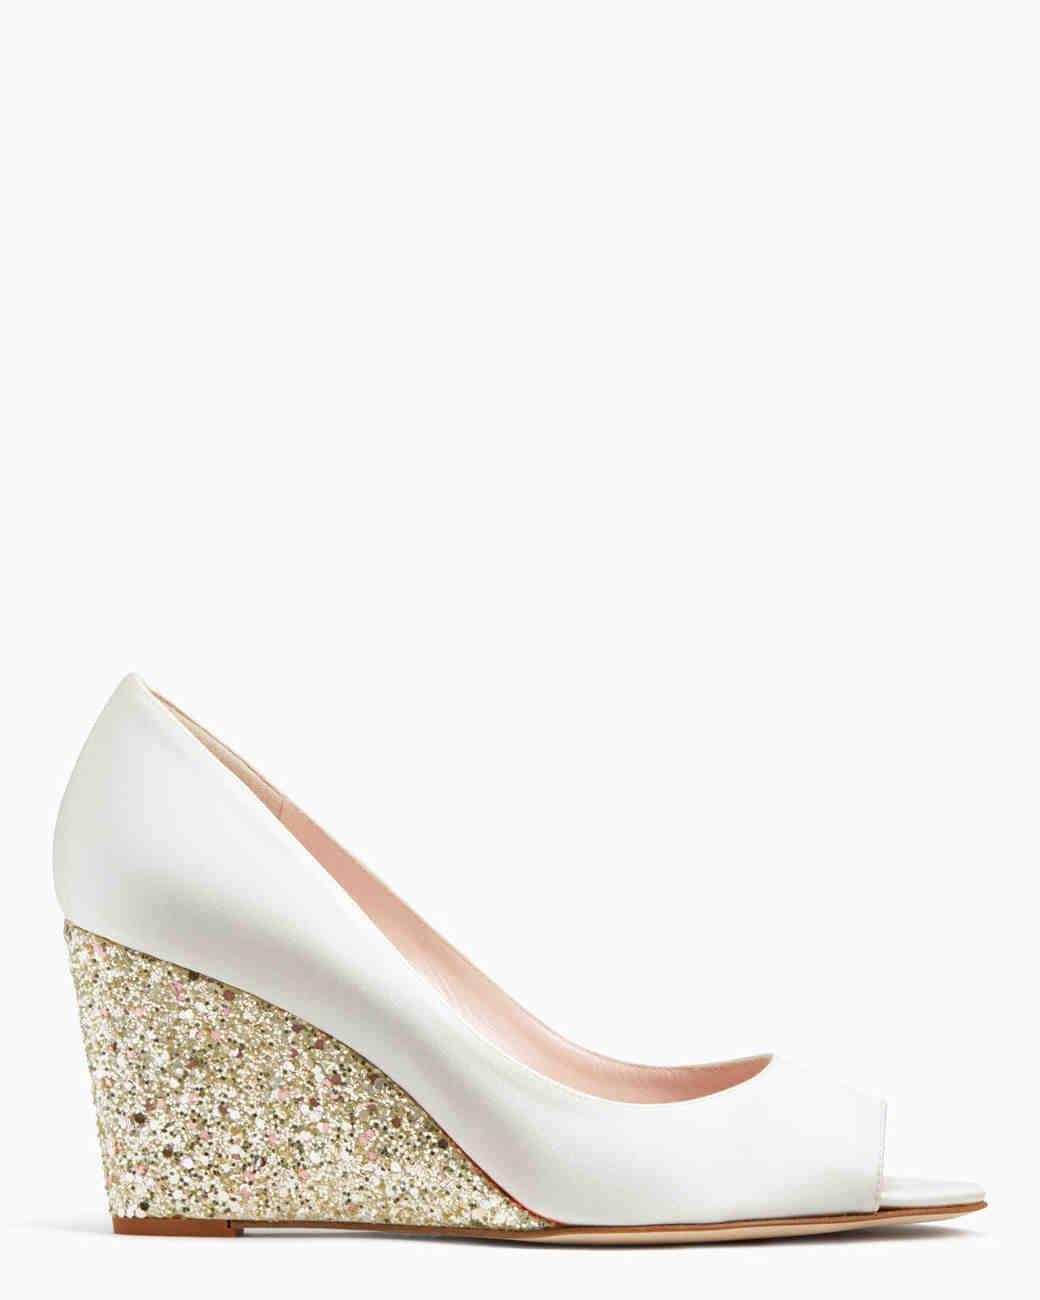 084b3c4675da Wedding Shoes That Won t Sink Into the Grass at an Outdoor Wedding ...